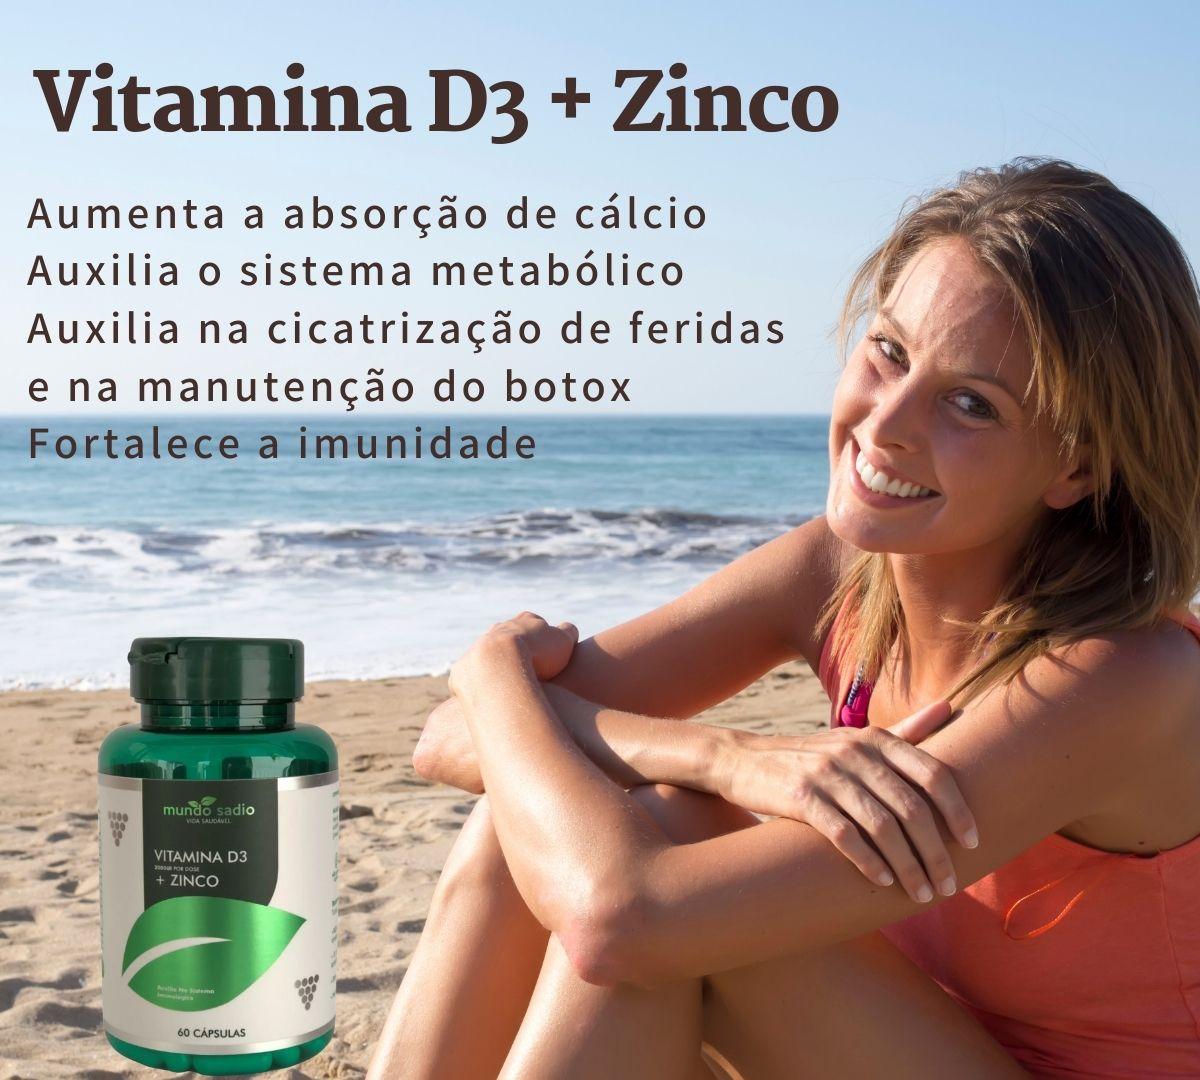 VITAMINA D3 + ZINCO MUNDO SADIO 60 CÁPSULAS